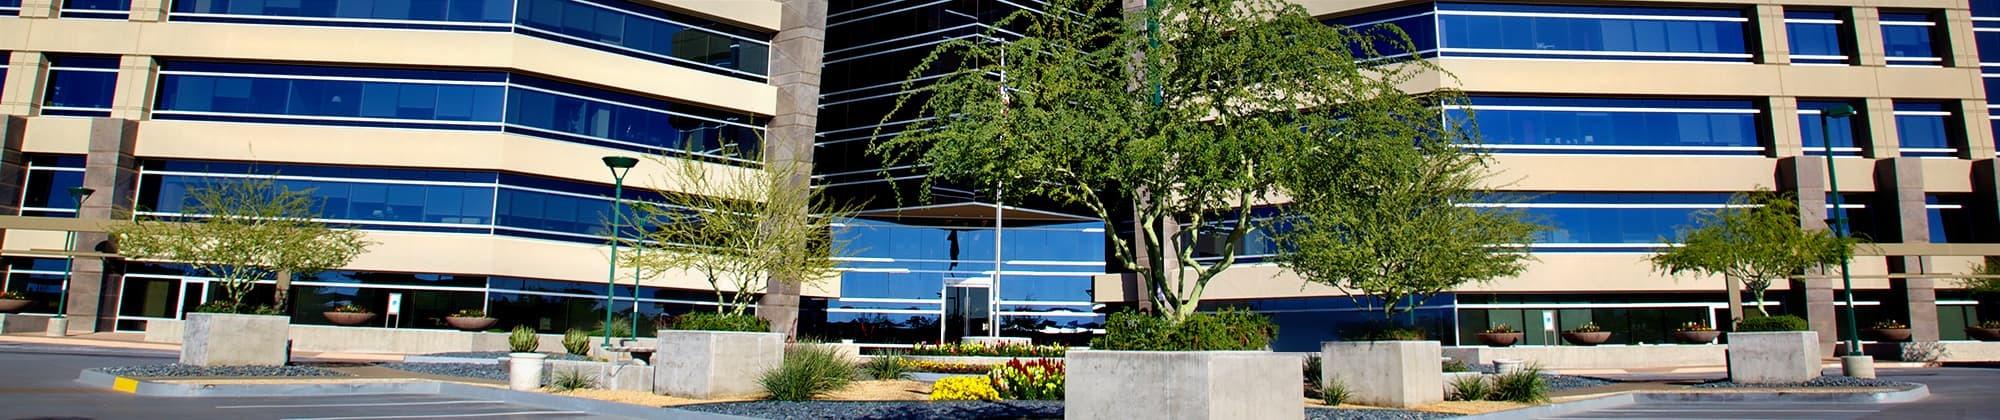 Personal Financial Management Advisors Scottsdale